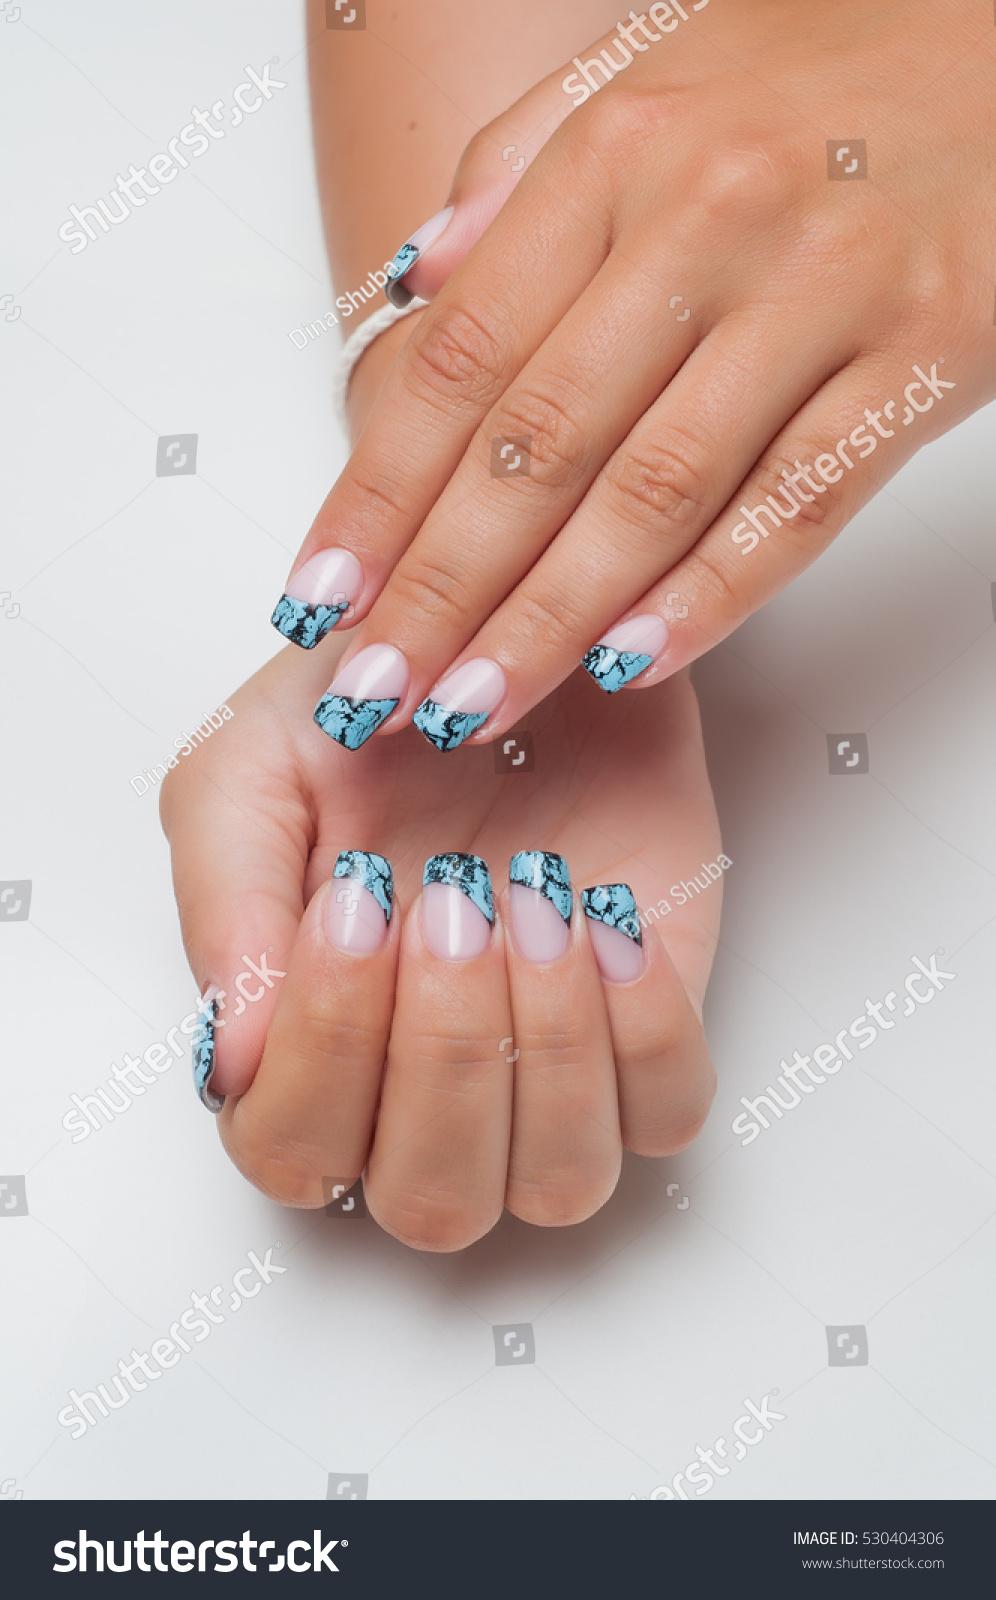 French Manicure Zolubym Cracelures Cracks On Stock Photo (Edit Now ...